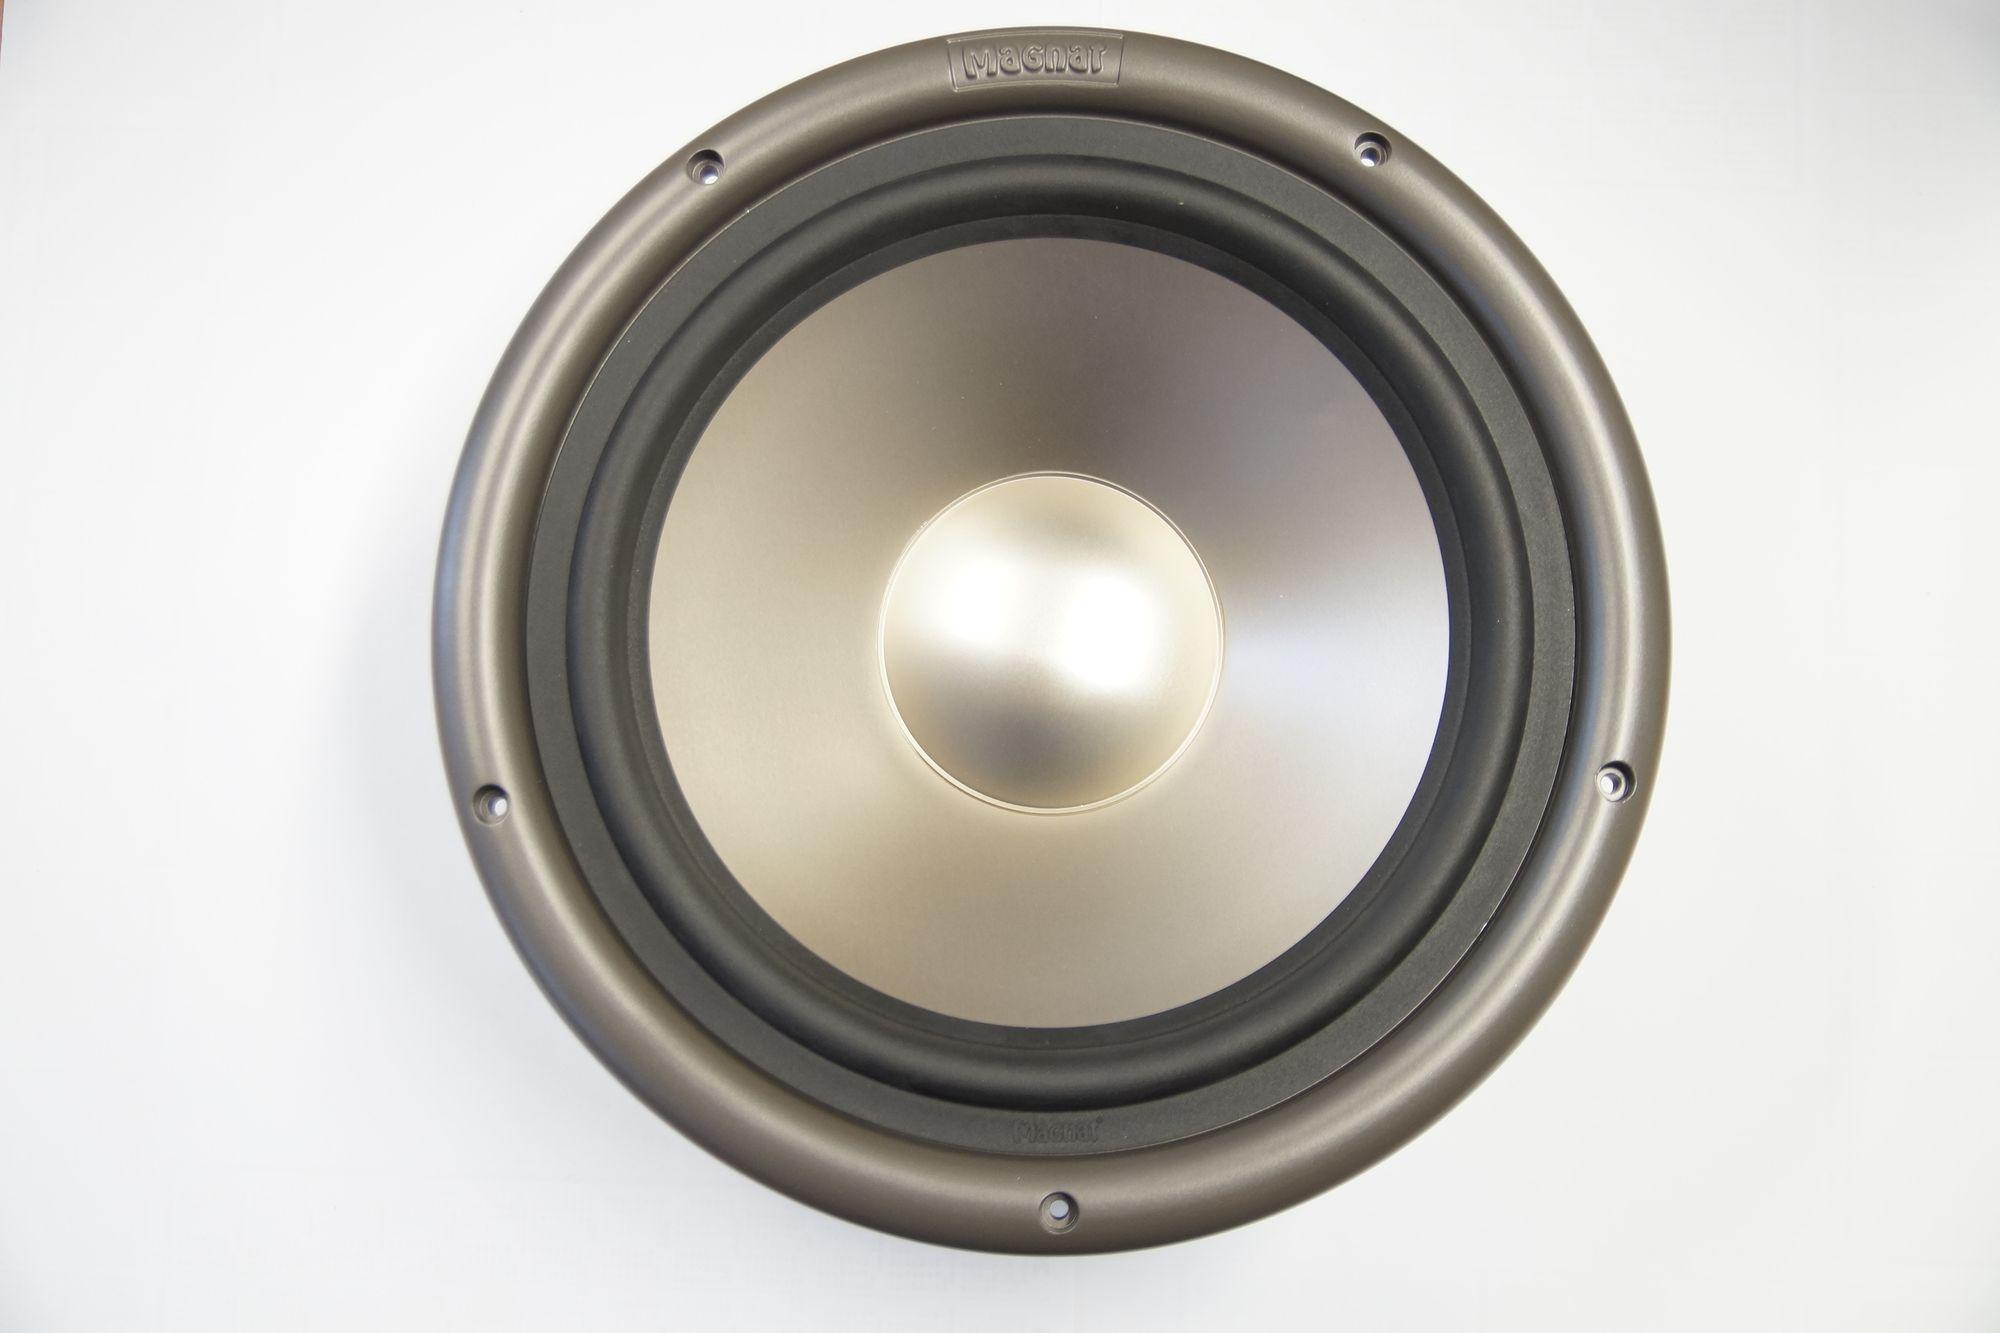 Magnat Vintage 990 Tieftöner MW AL 300 AL 3150  Basslautsprecher 30 cm 12 Zoll